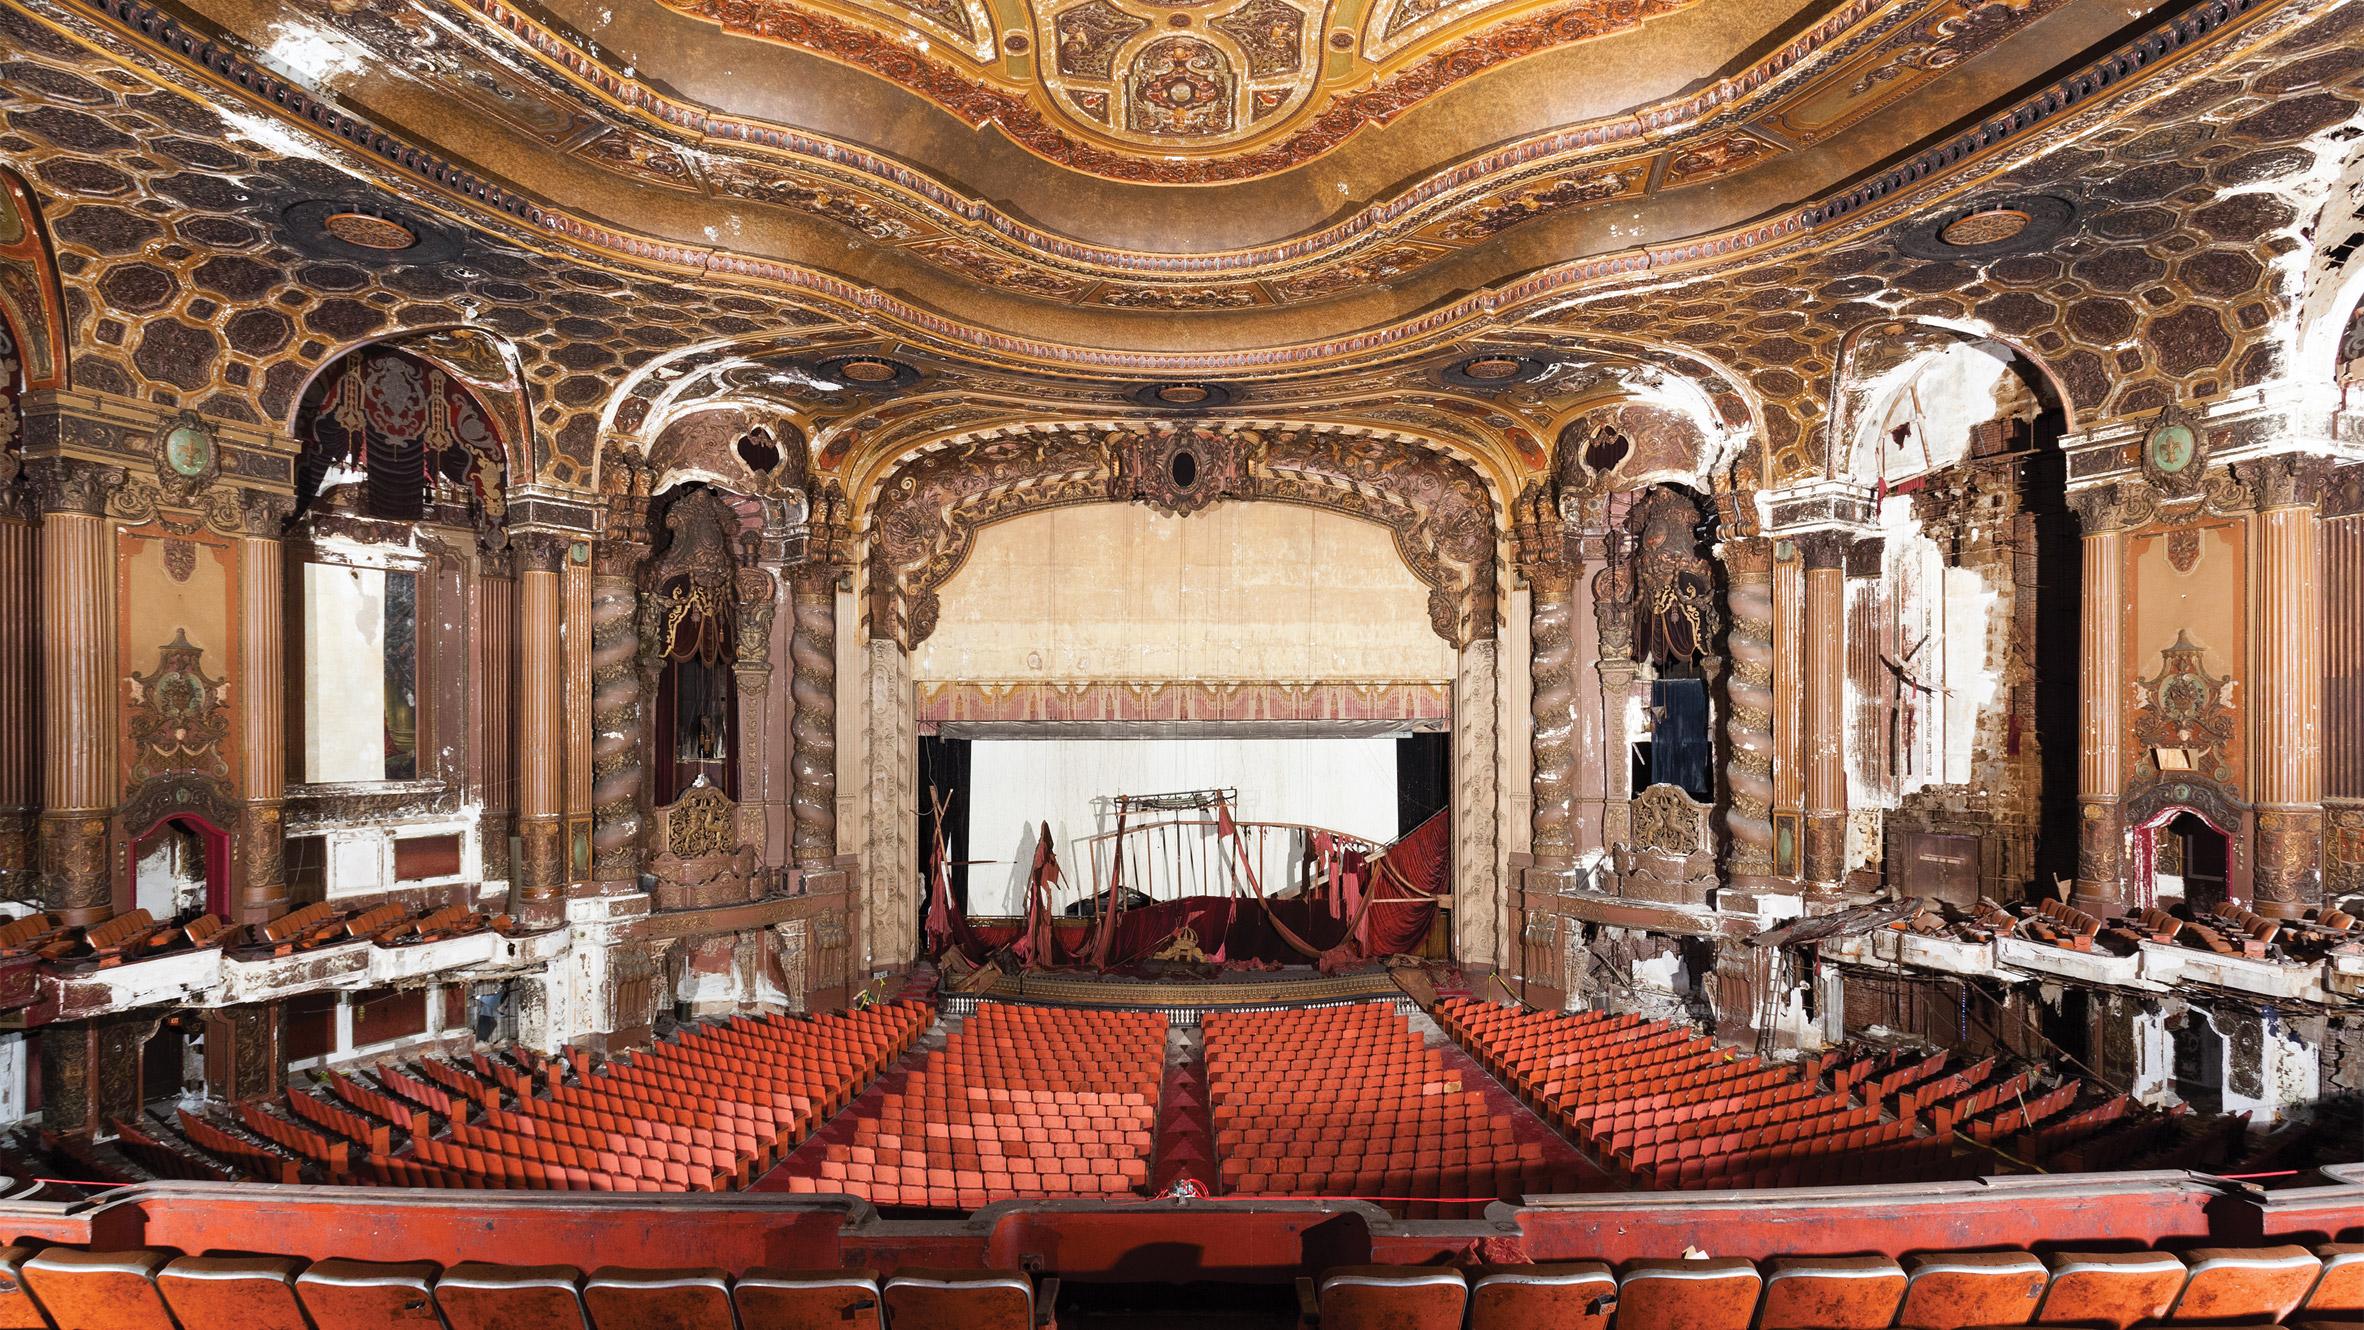 kings-theatre-new-york-matt-lambros-after-the-final-curtain